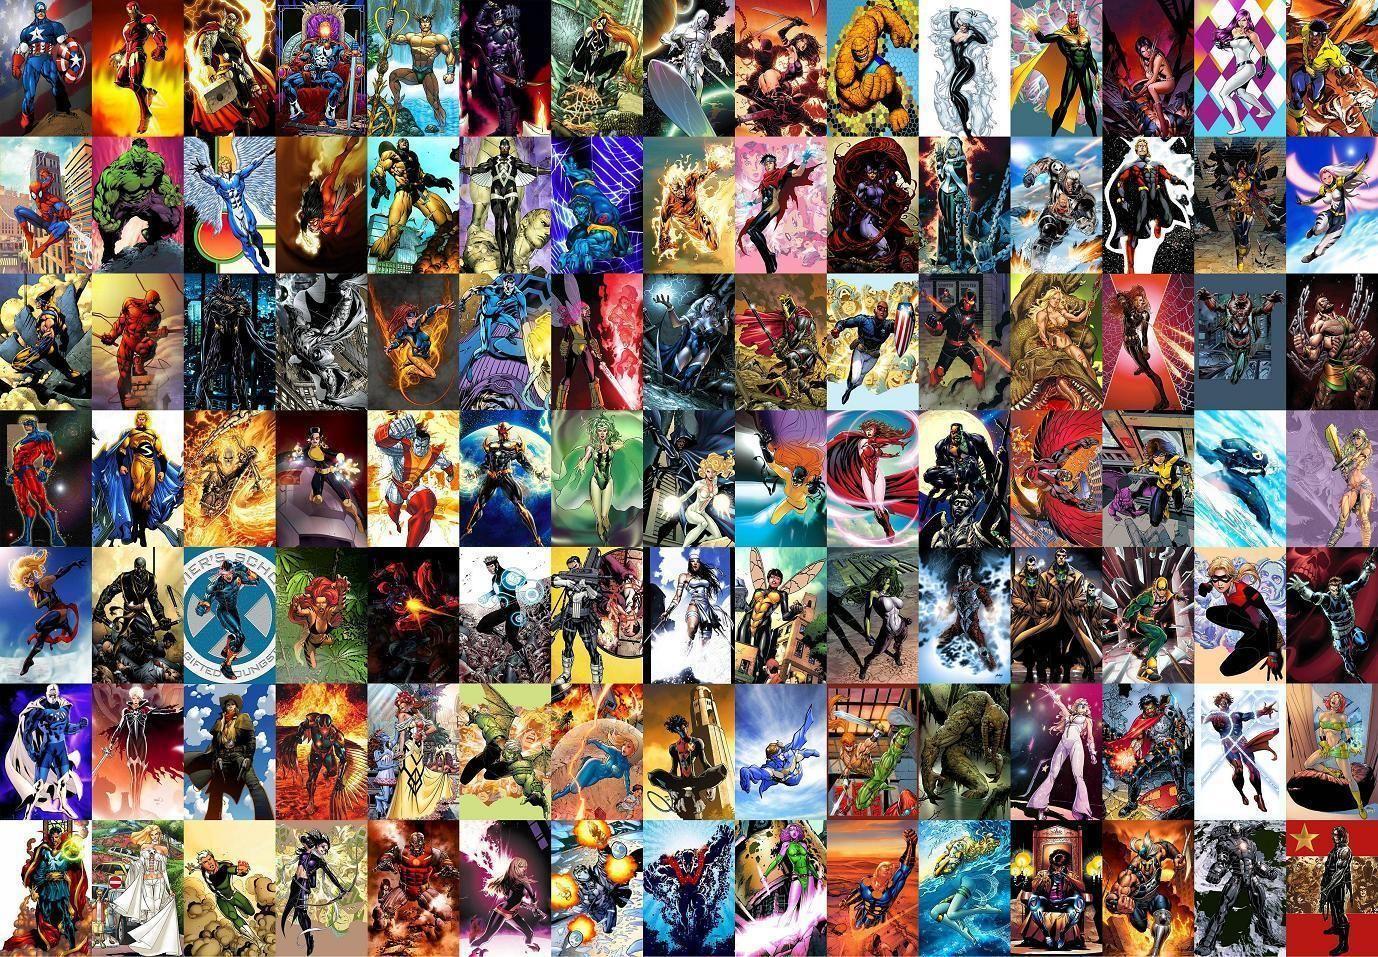 Marvel Super Heroes Wallpaper In 2020 Marvel Comics Wallpaper Marvel Wallpaper Superhero Wallpaper